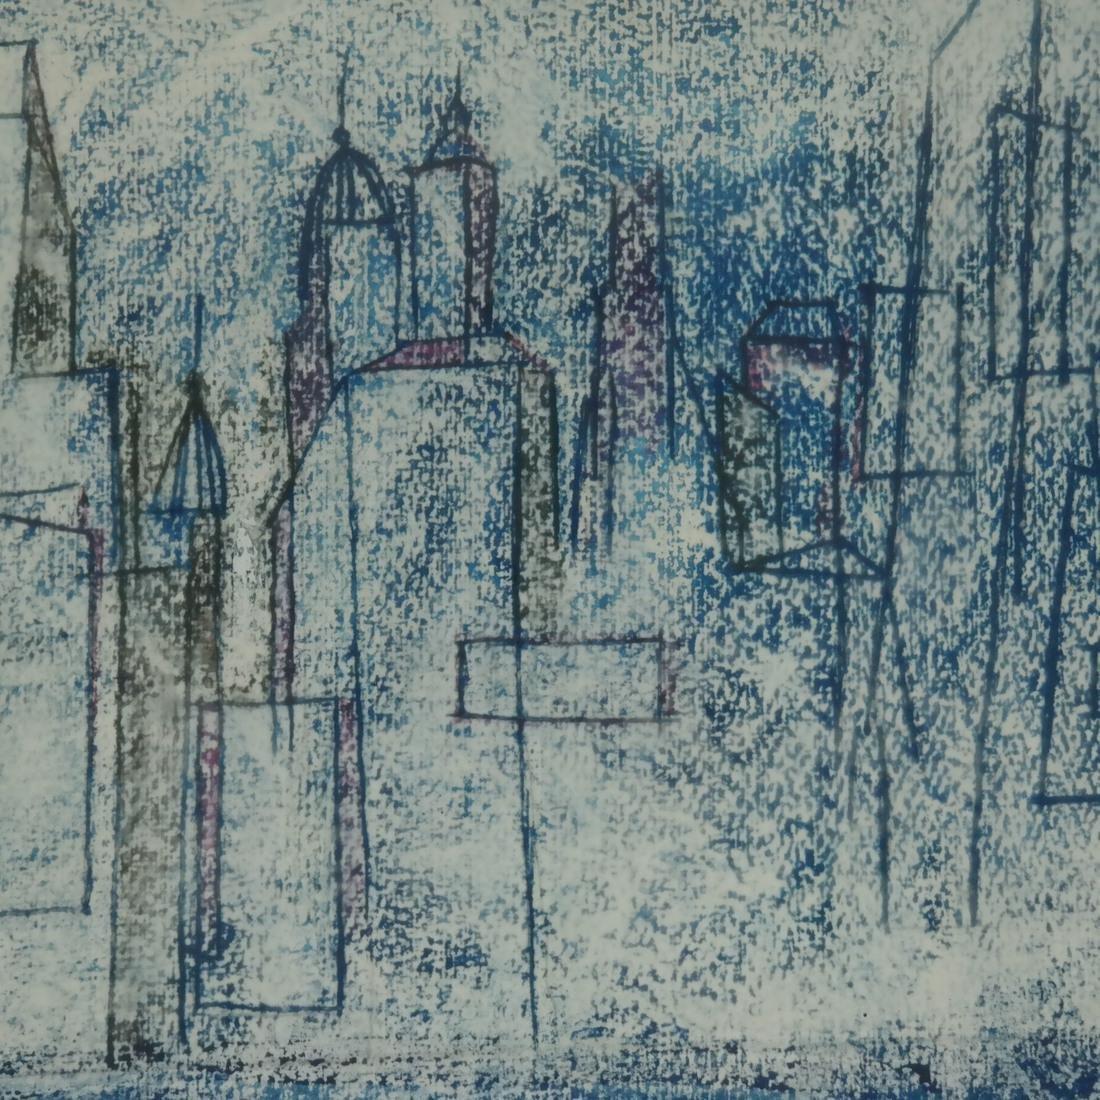 Modern City Skyline, Mixed Media - 3